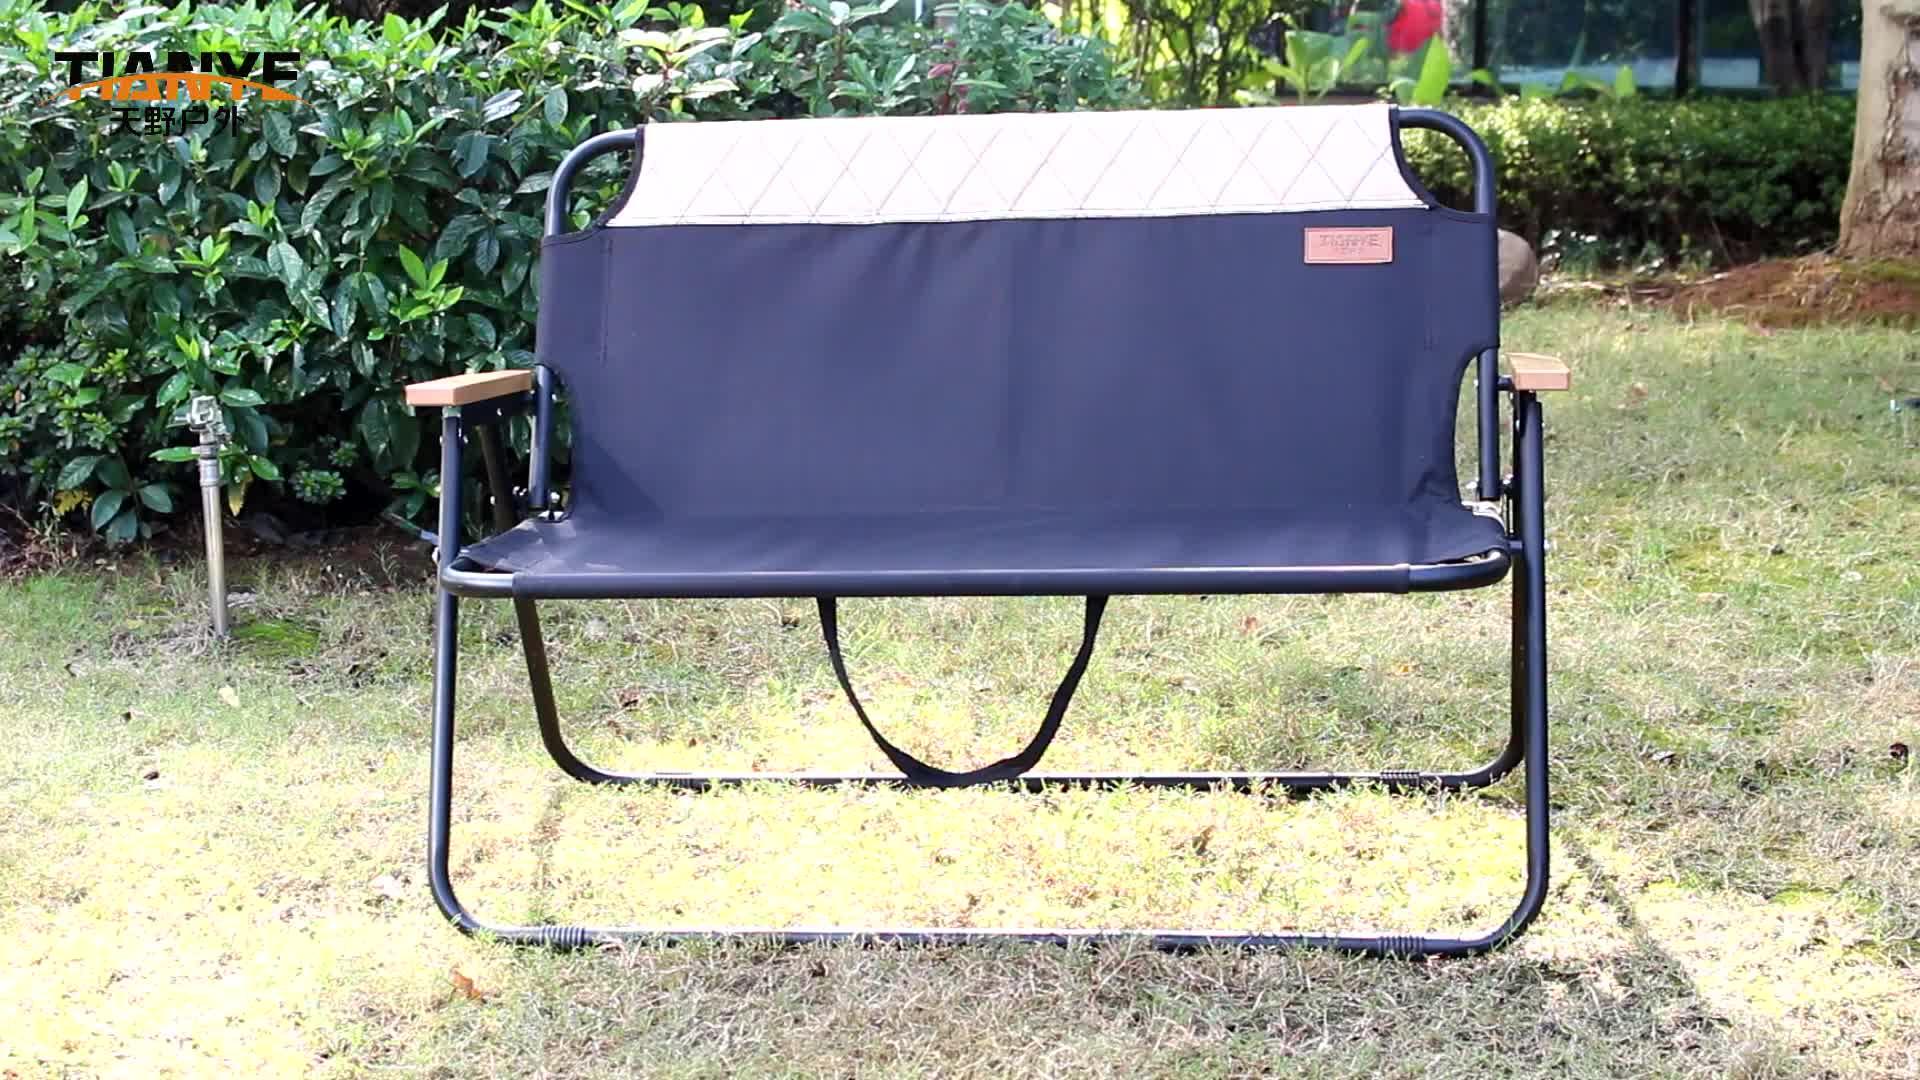 Tianye 두 사람 접는 휴대용 캠핑 벤치 소프트 더블 좌석 비치 의자